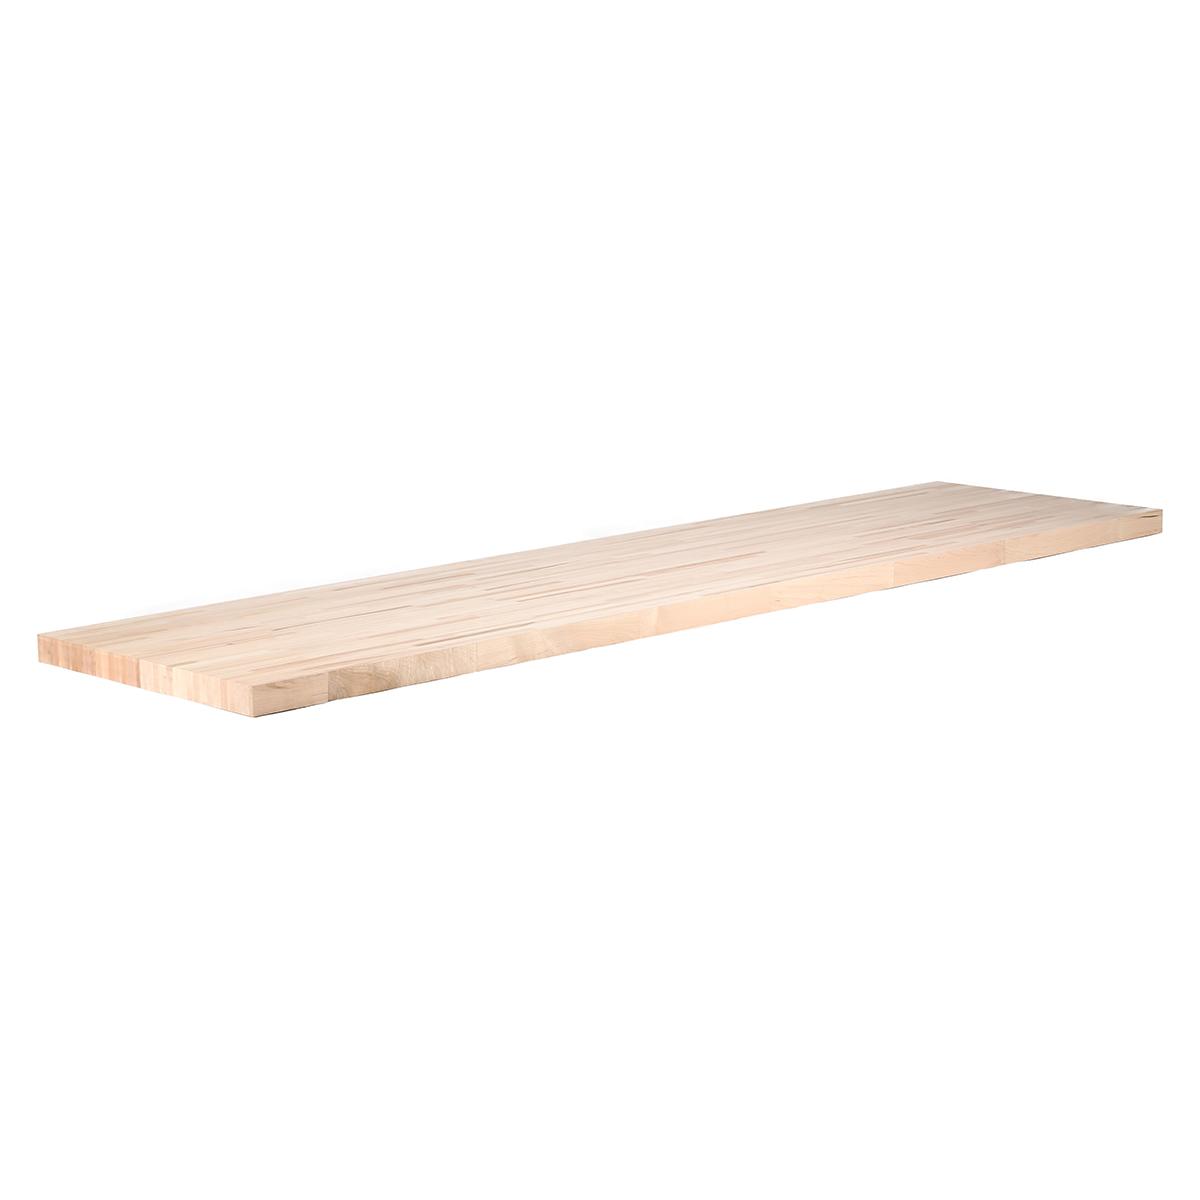 2×8 Workbench Top